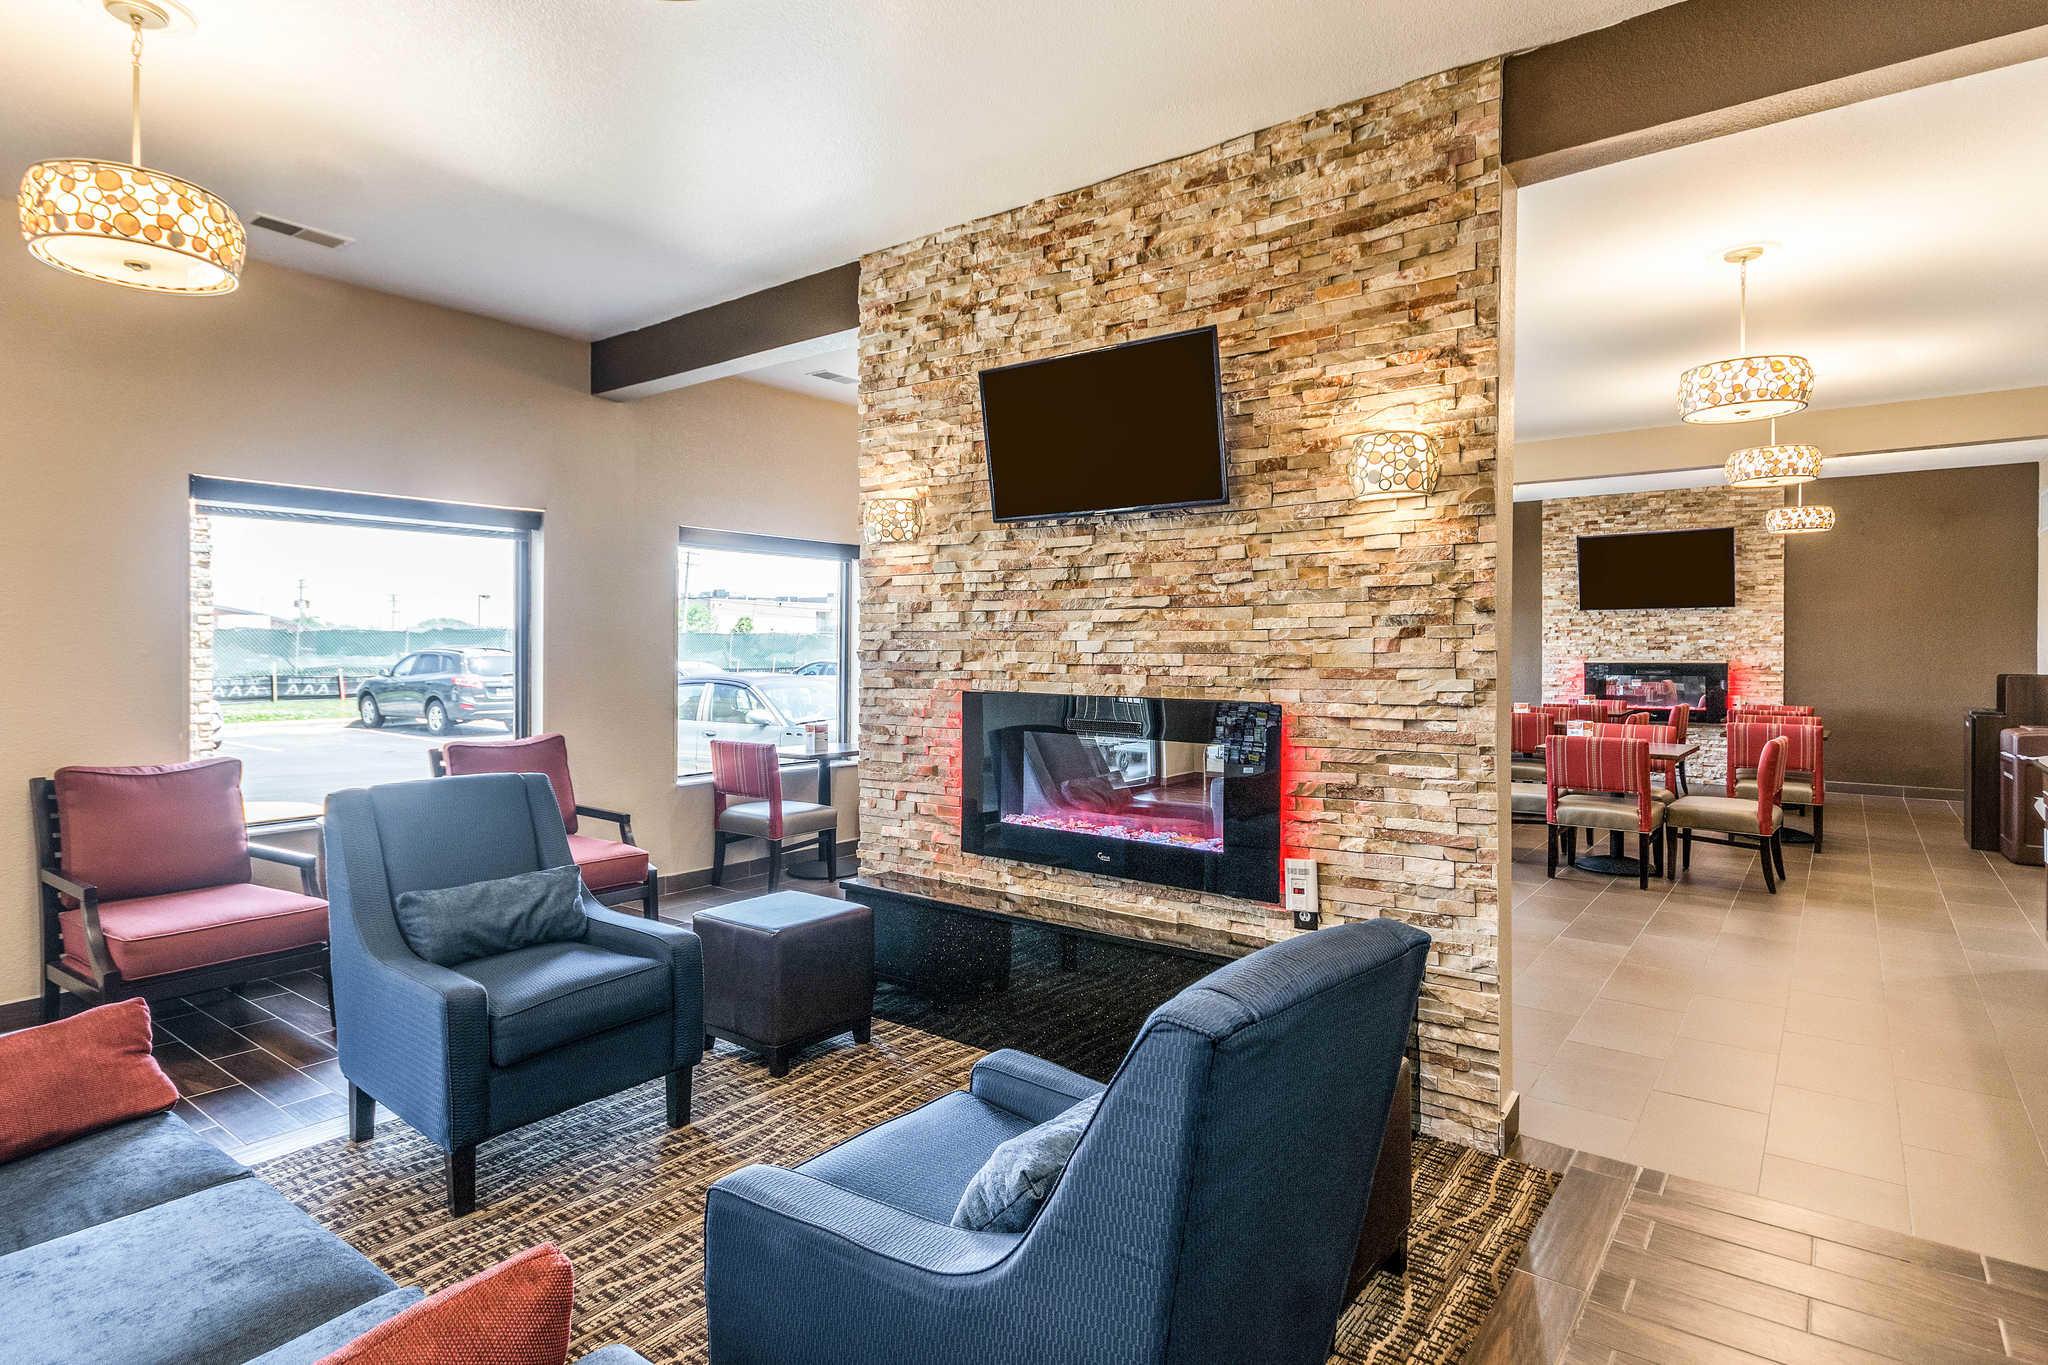 Comfort Inn & Suites North Aurora - Naperville image 5